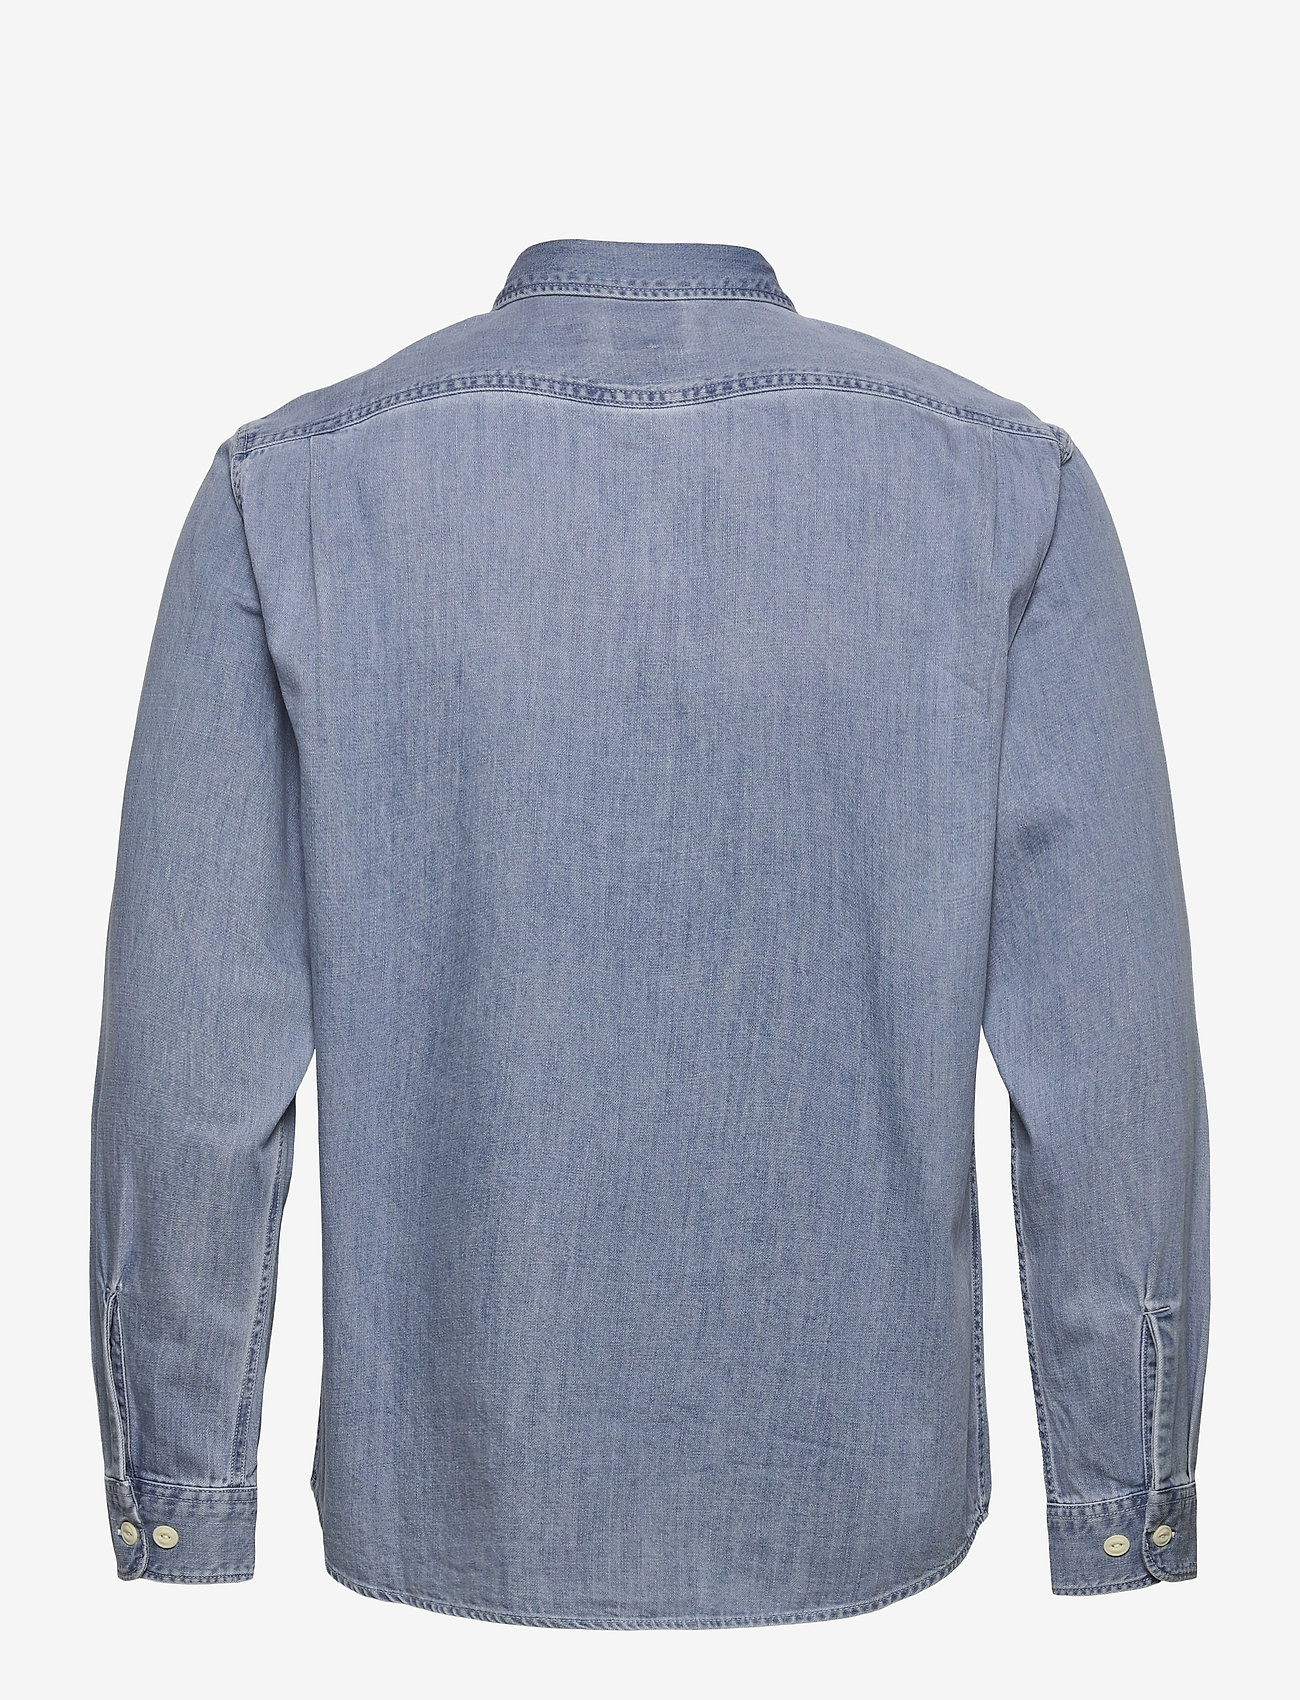 Lee Jeans - WORKER SHIRT - denim shirts - frost blue - 1